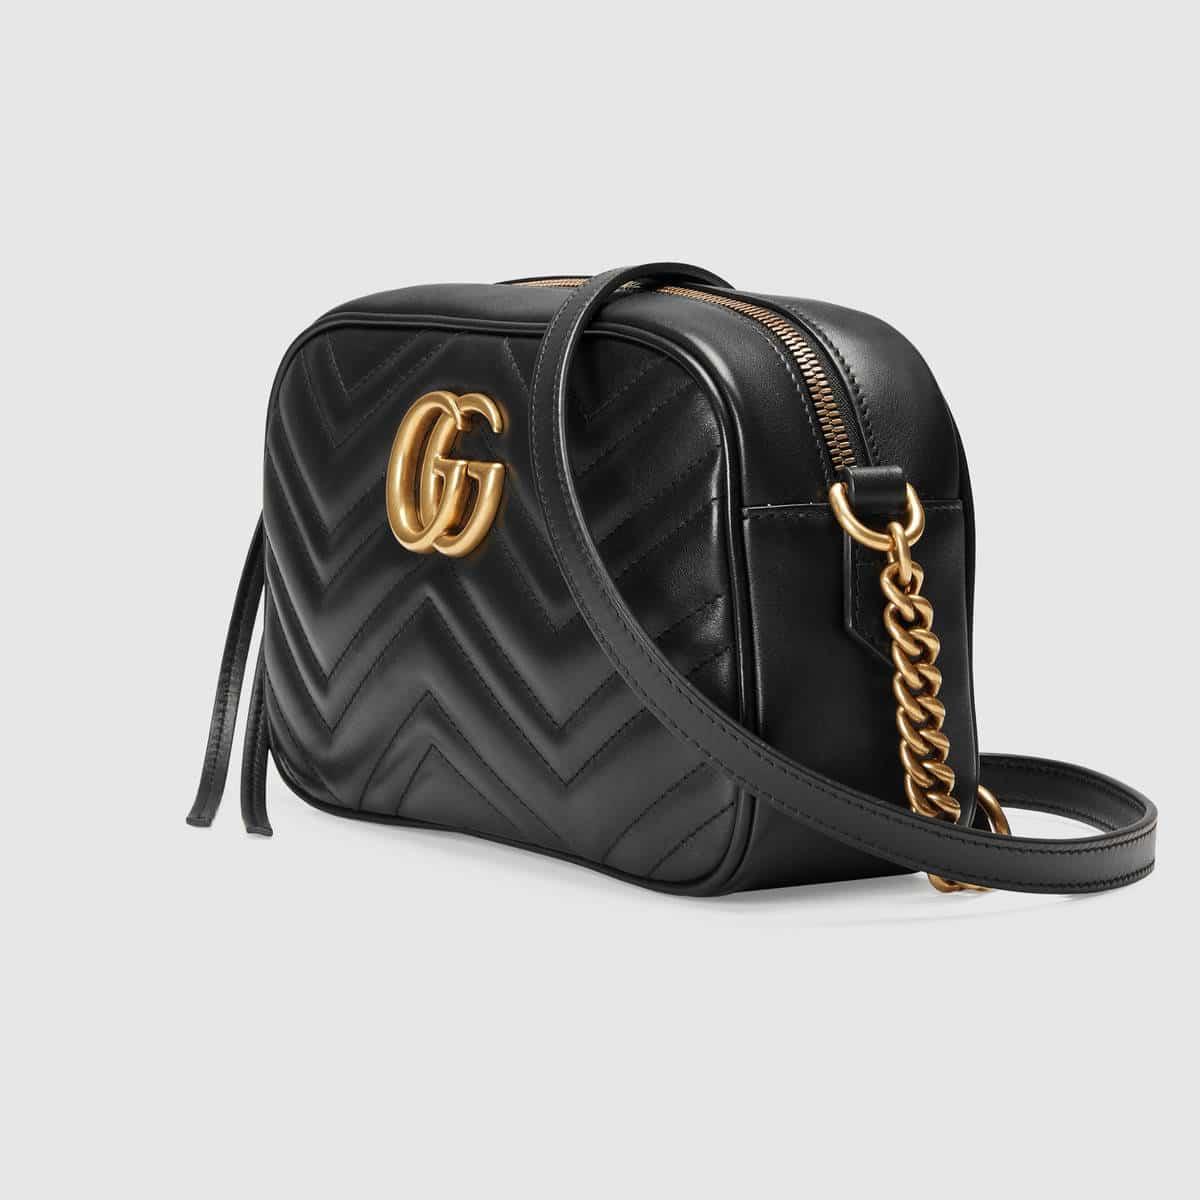 GG Marmont Medium Camera Bag | Gucci